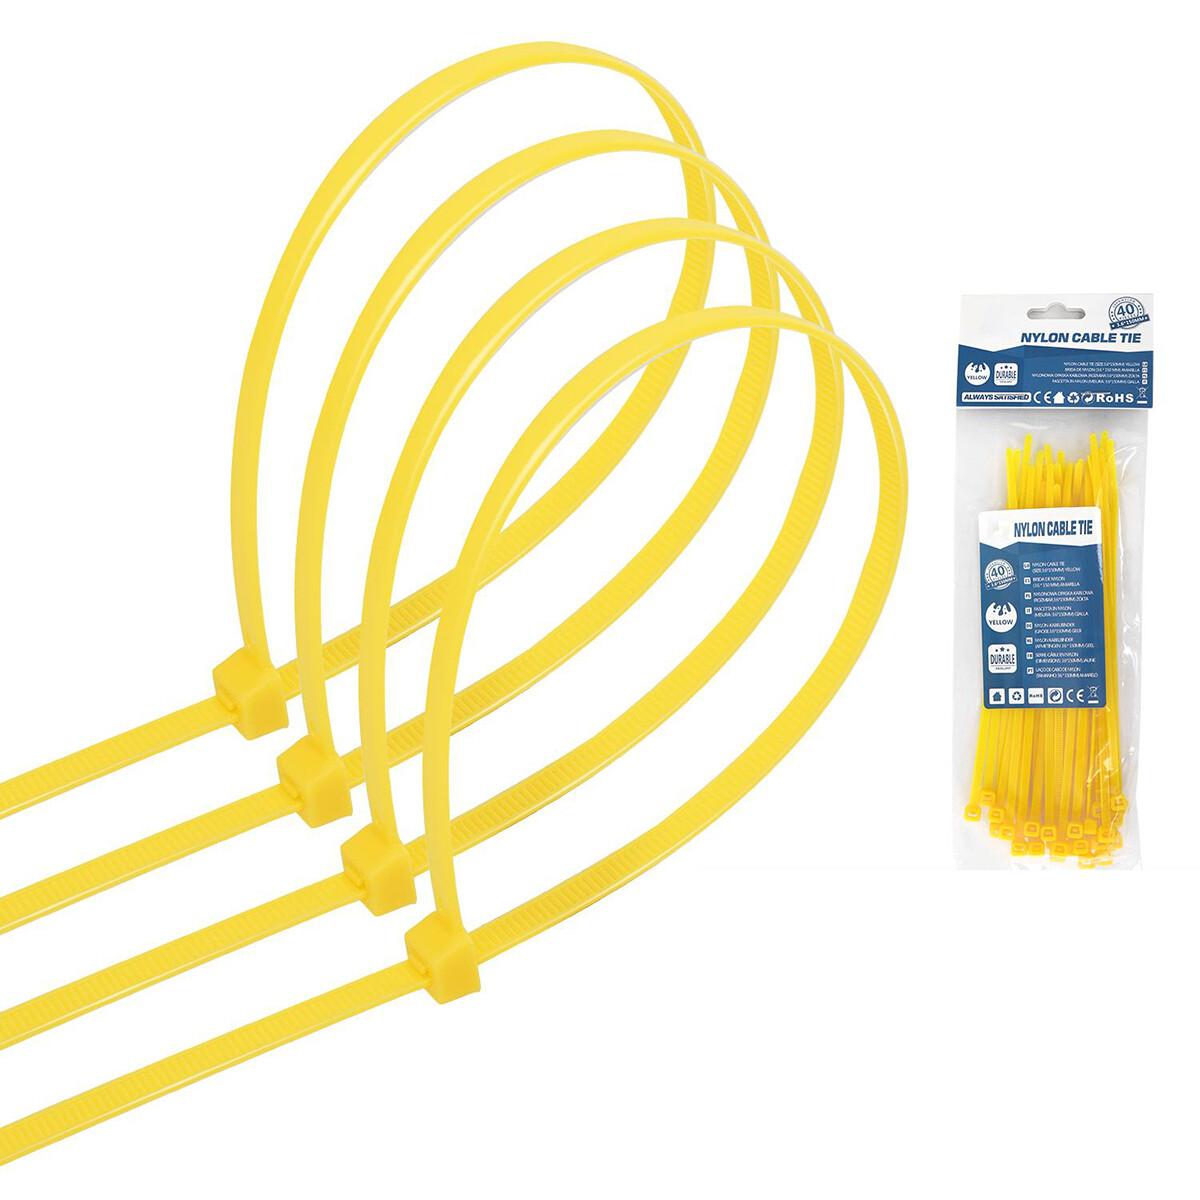 Tie Wraps - Tyrap - Aigi Tie - 3.6x150mm - Geel - 40 Stuks